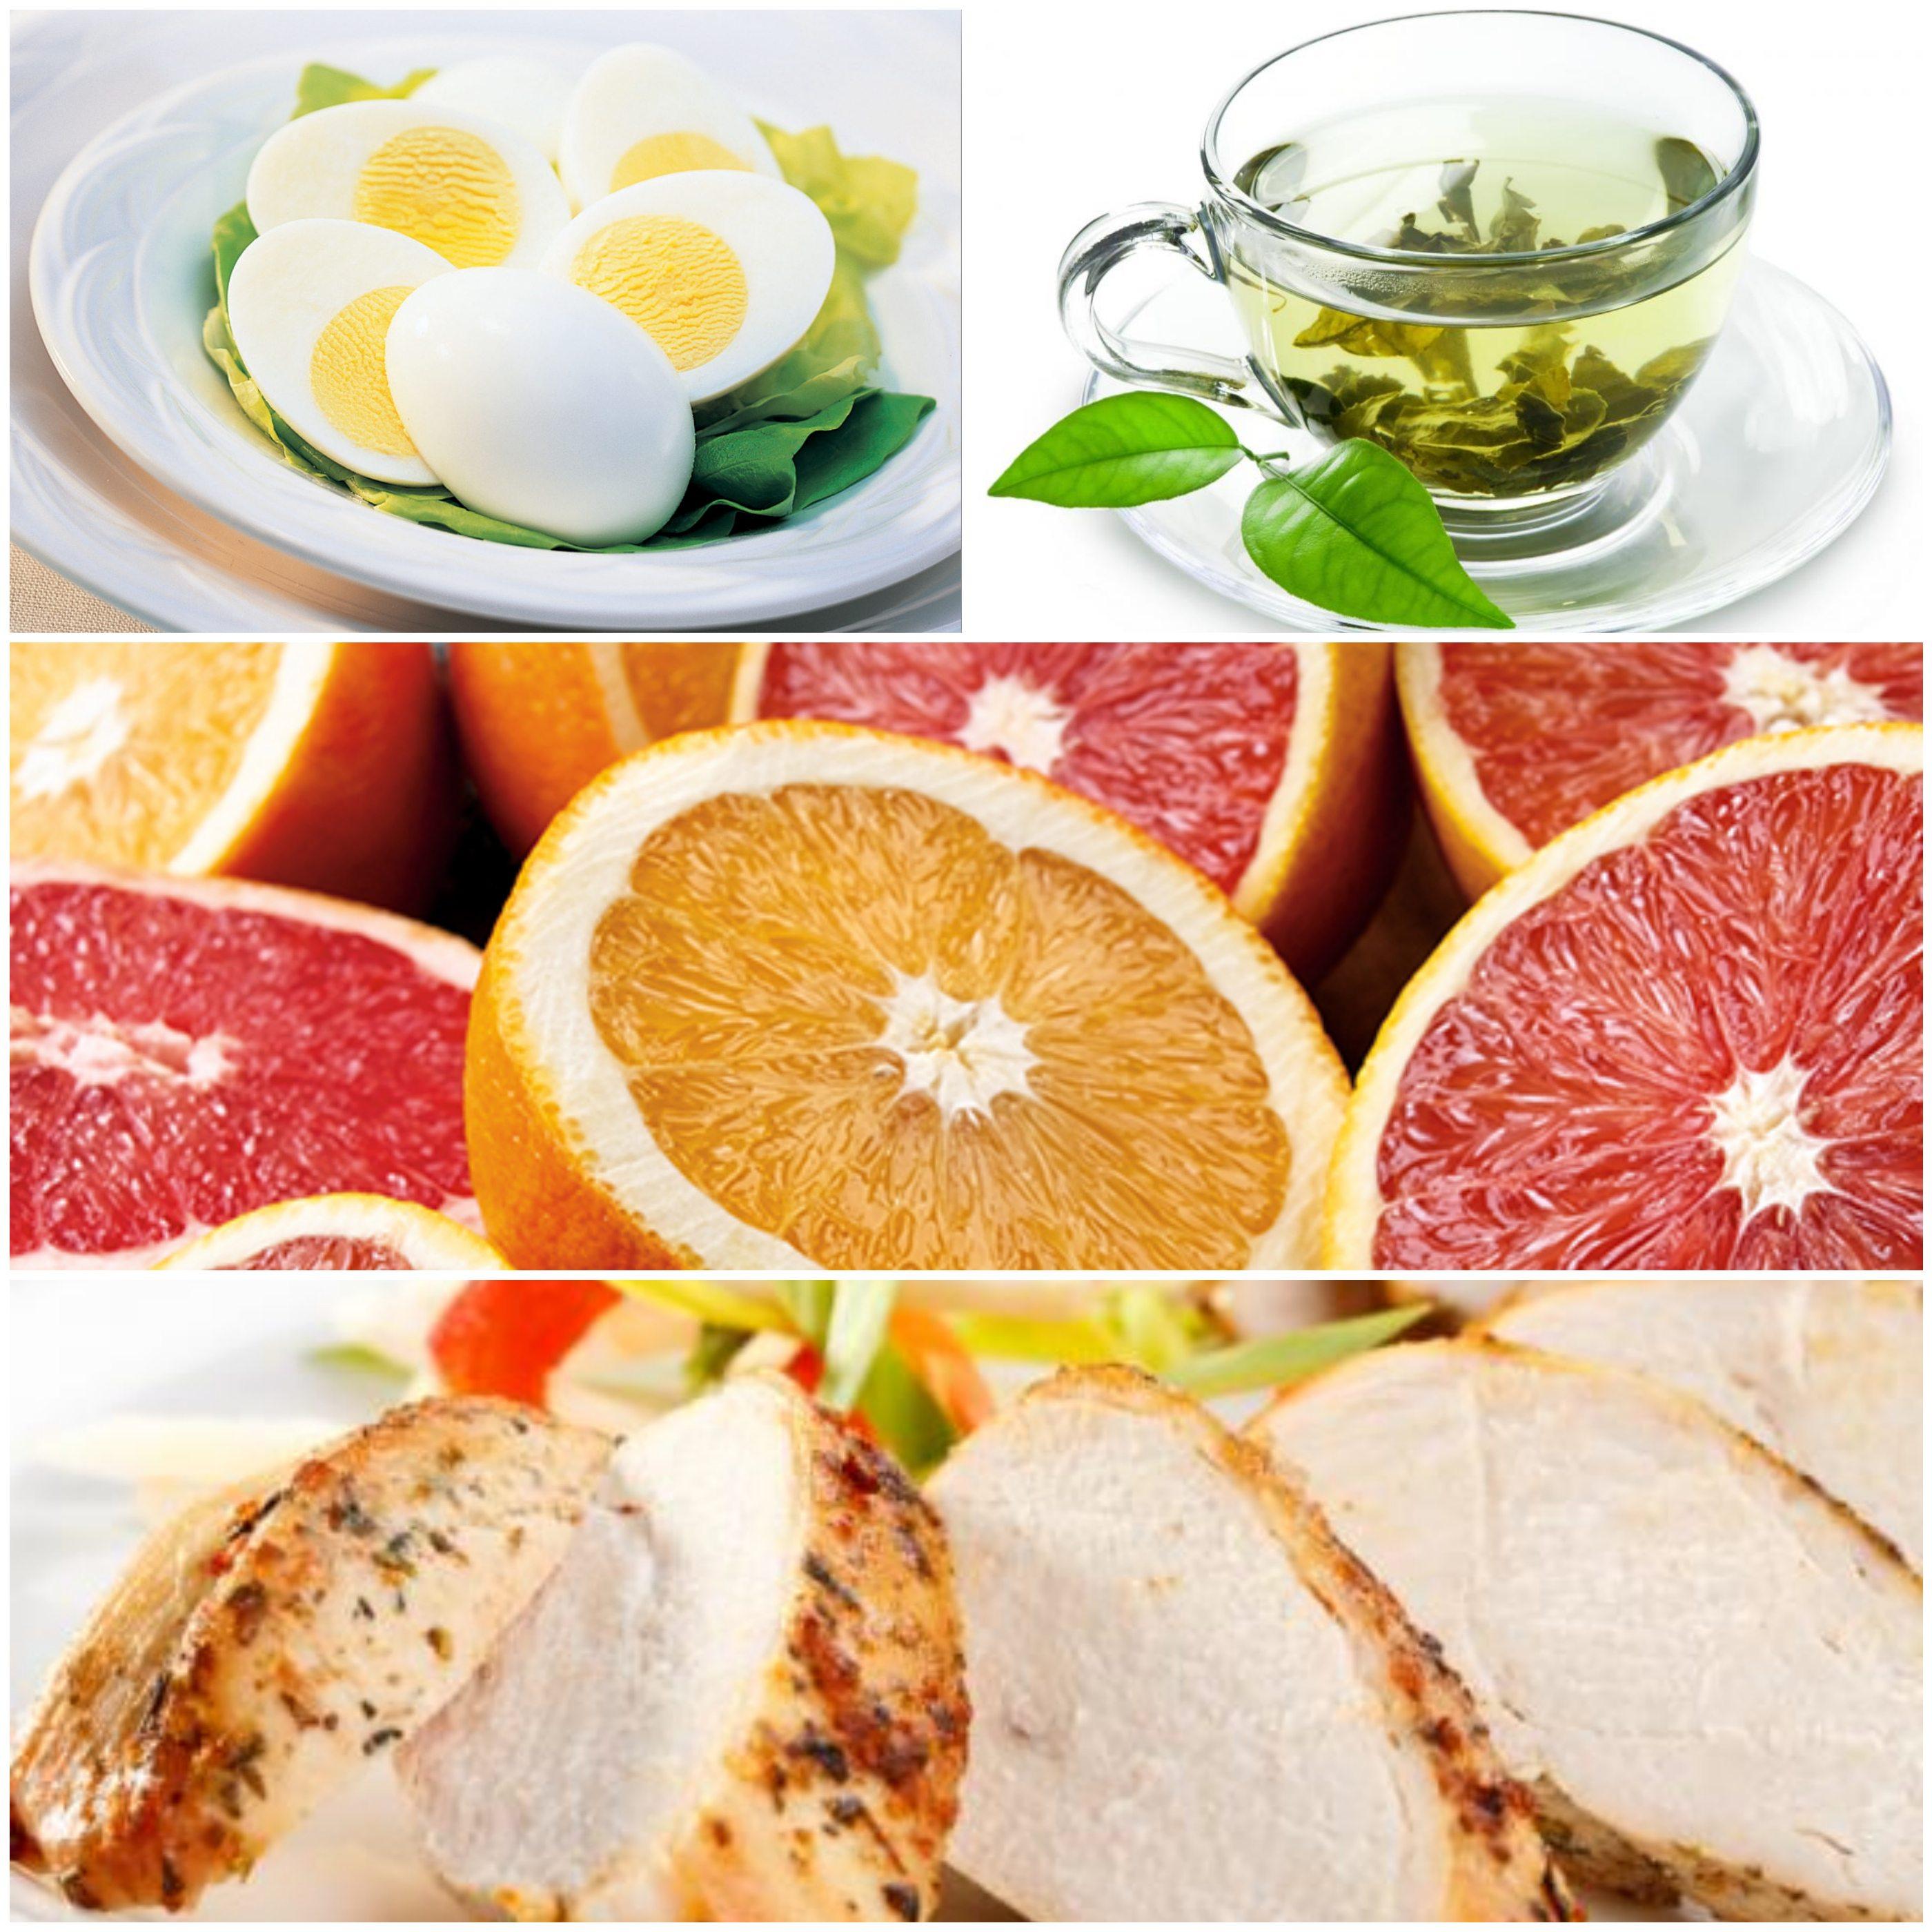 Top 5 energising foods